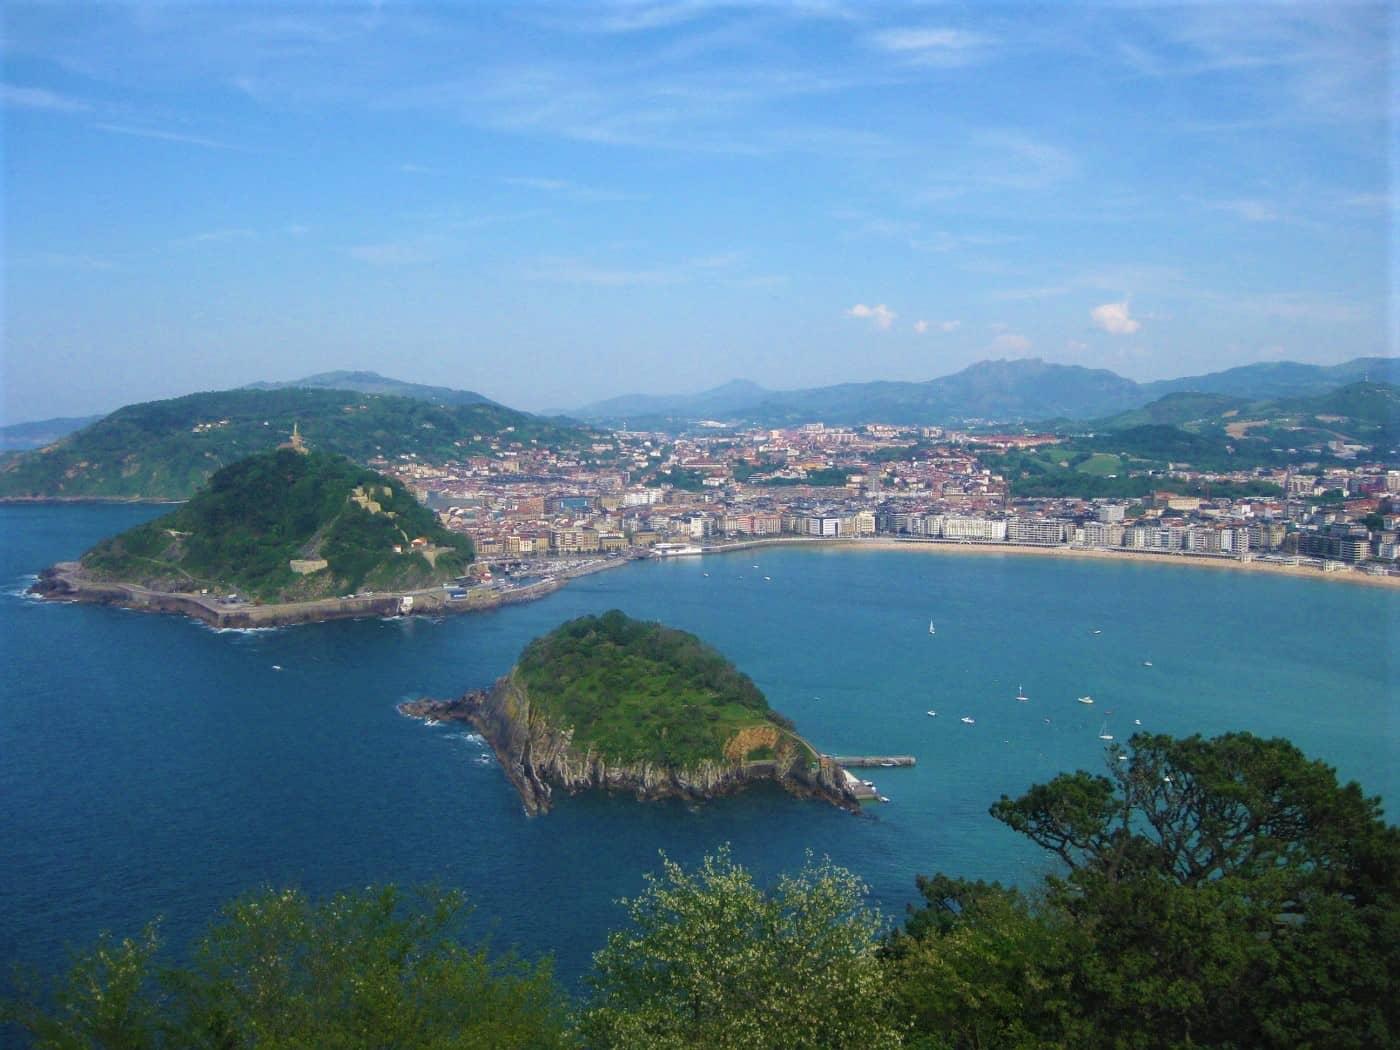 View of San Sebastian from Monte Igueldo